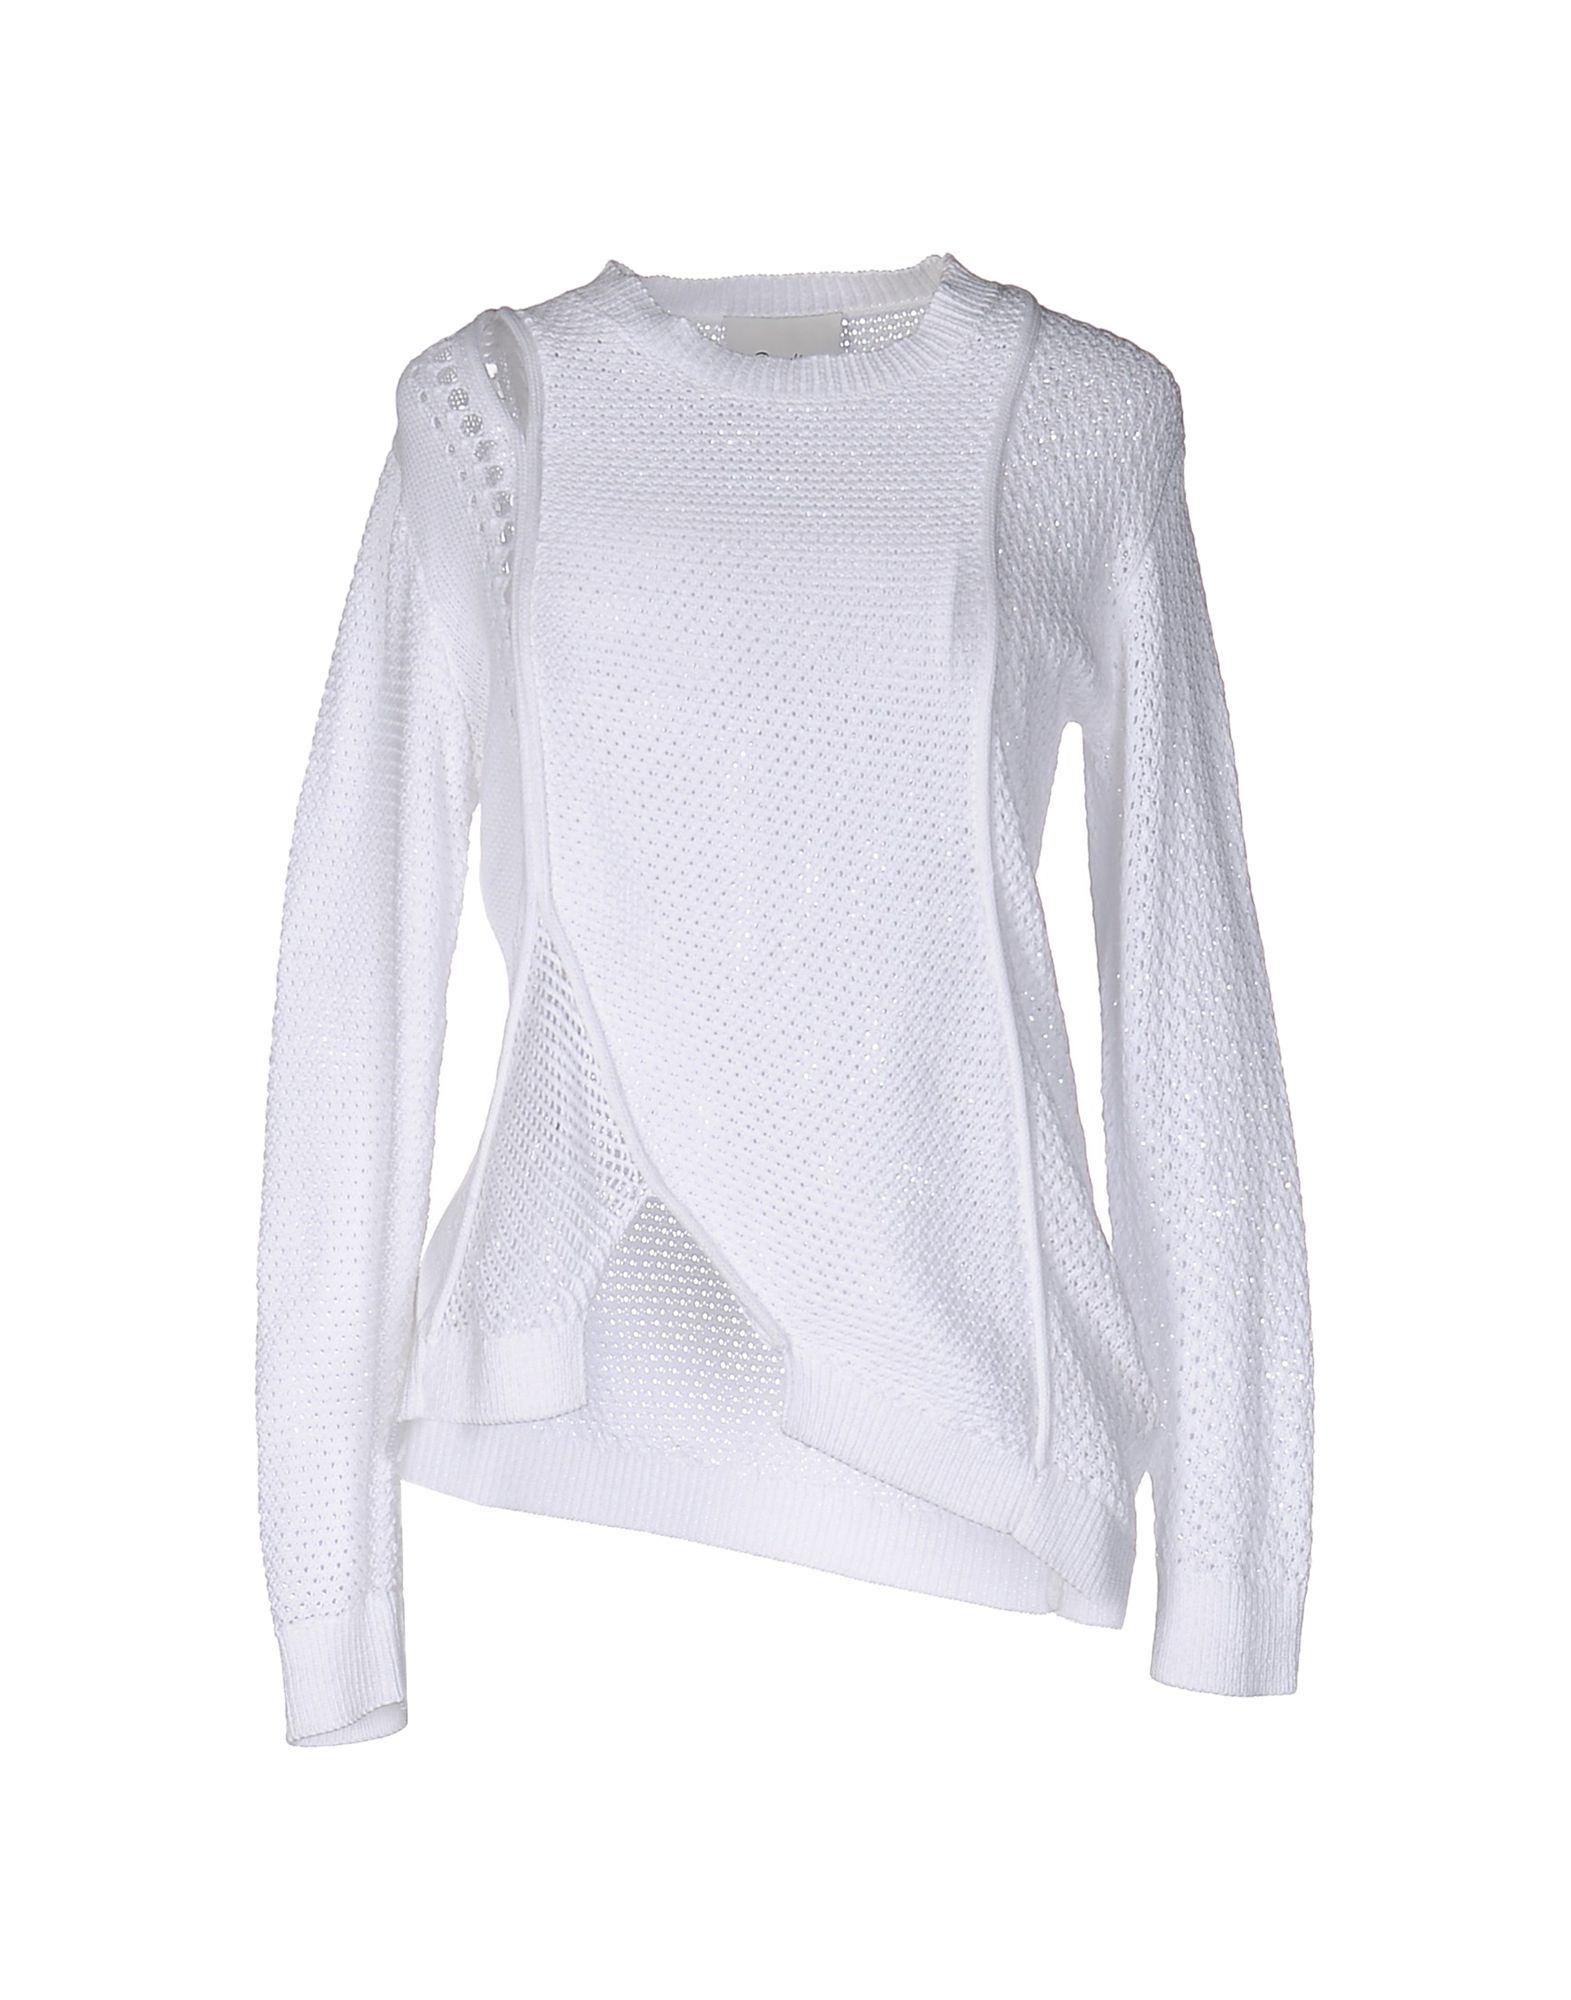 3.1 Phillip Lim Women Sweater on YOOX.COM. The best online ...